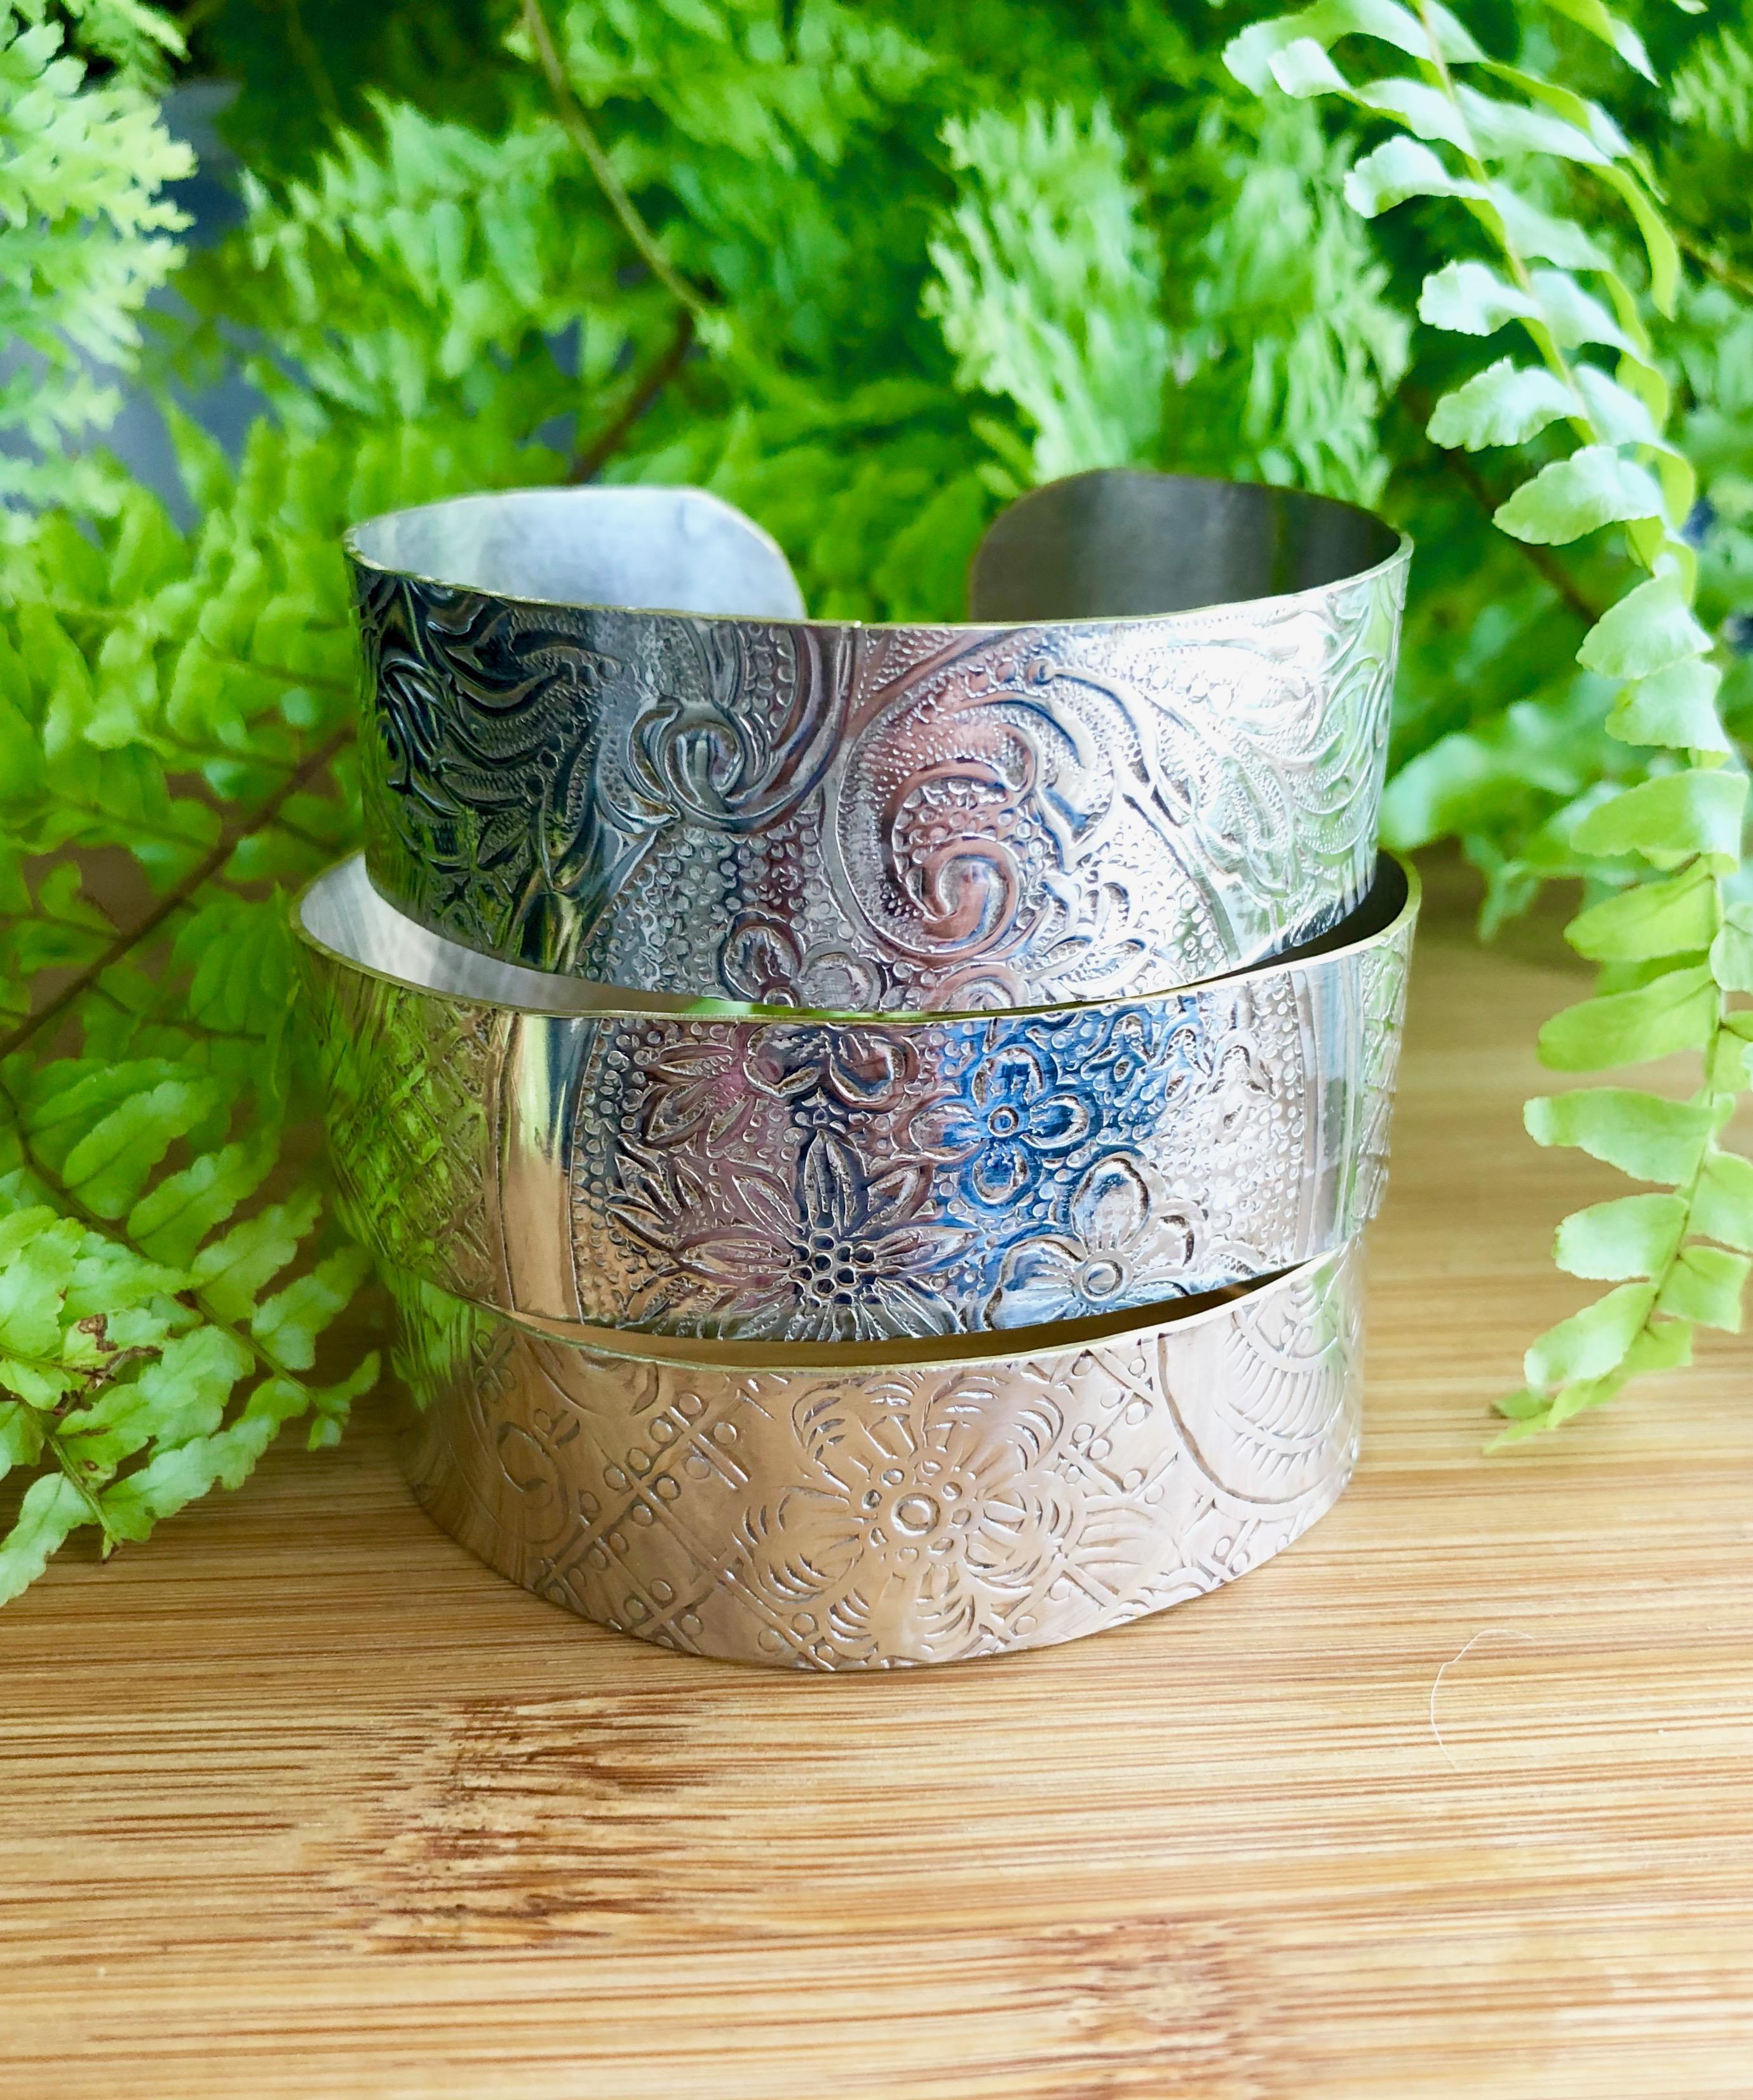 repurposed silver platter cuff bracelets